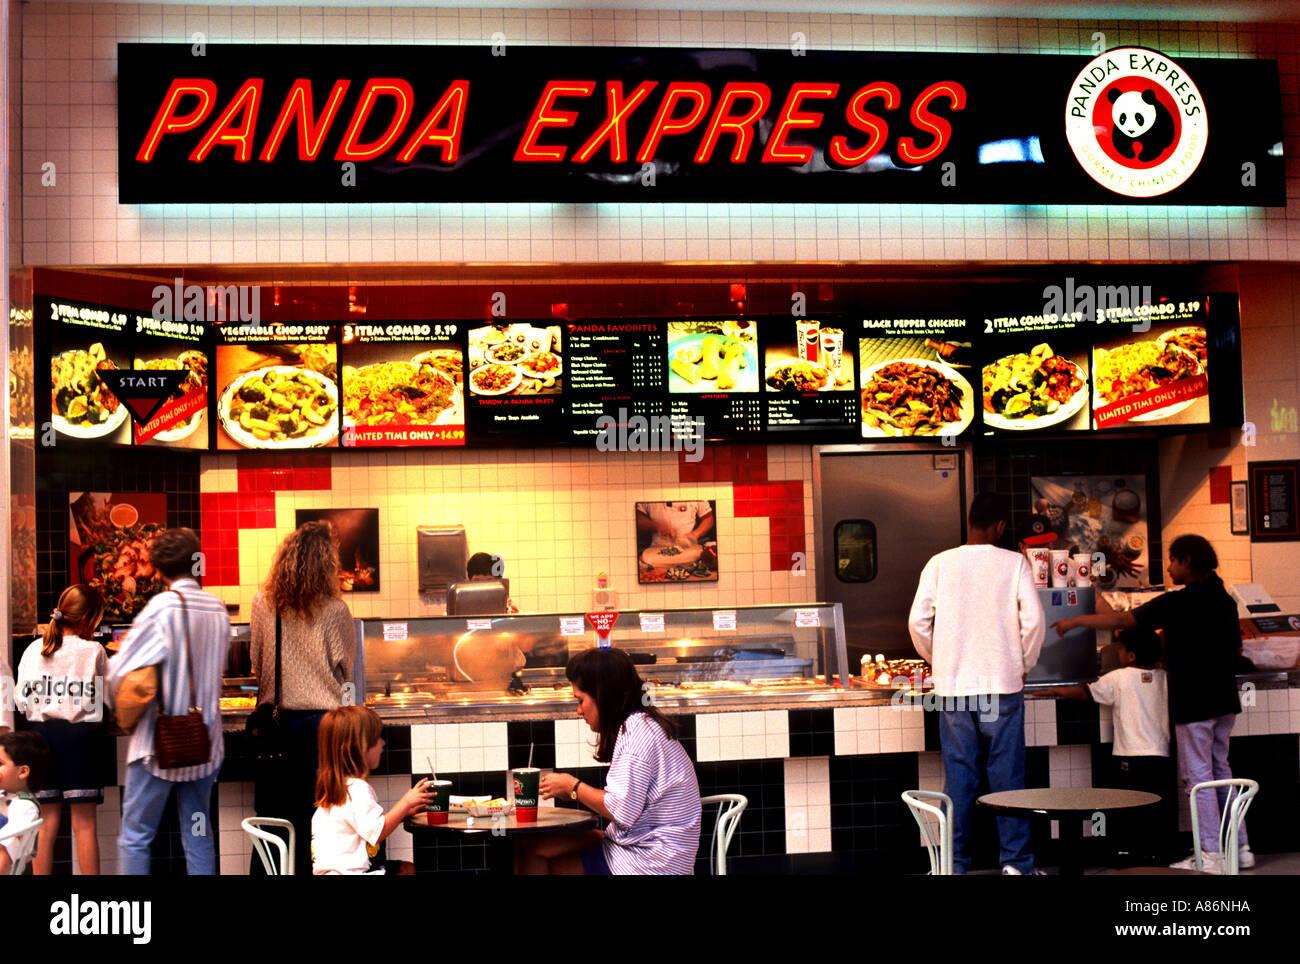 Austin Texas Panda Express Fast Food United States Stock Photo